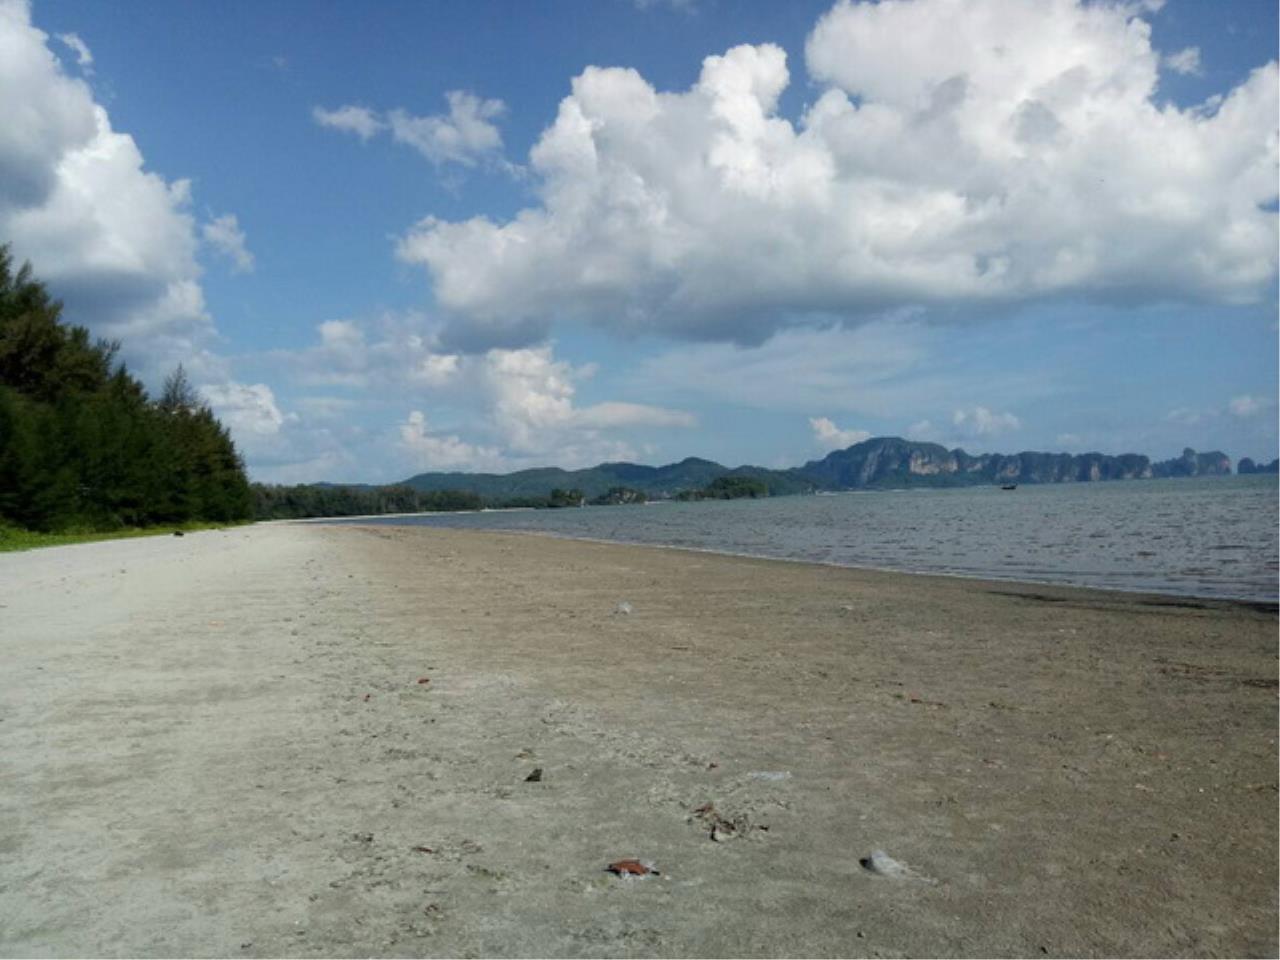 38643-Land for sale, in Krabi province, 16 rai 200 sq.wa.